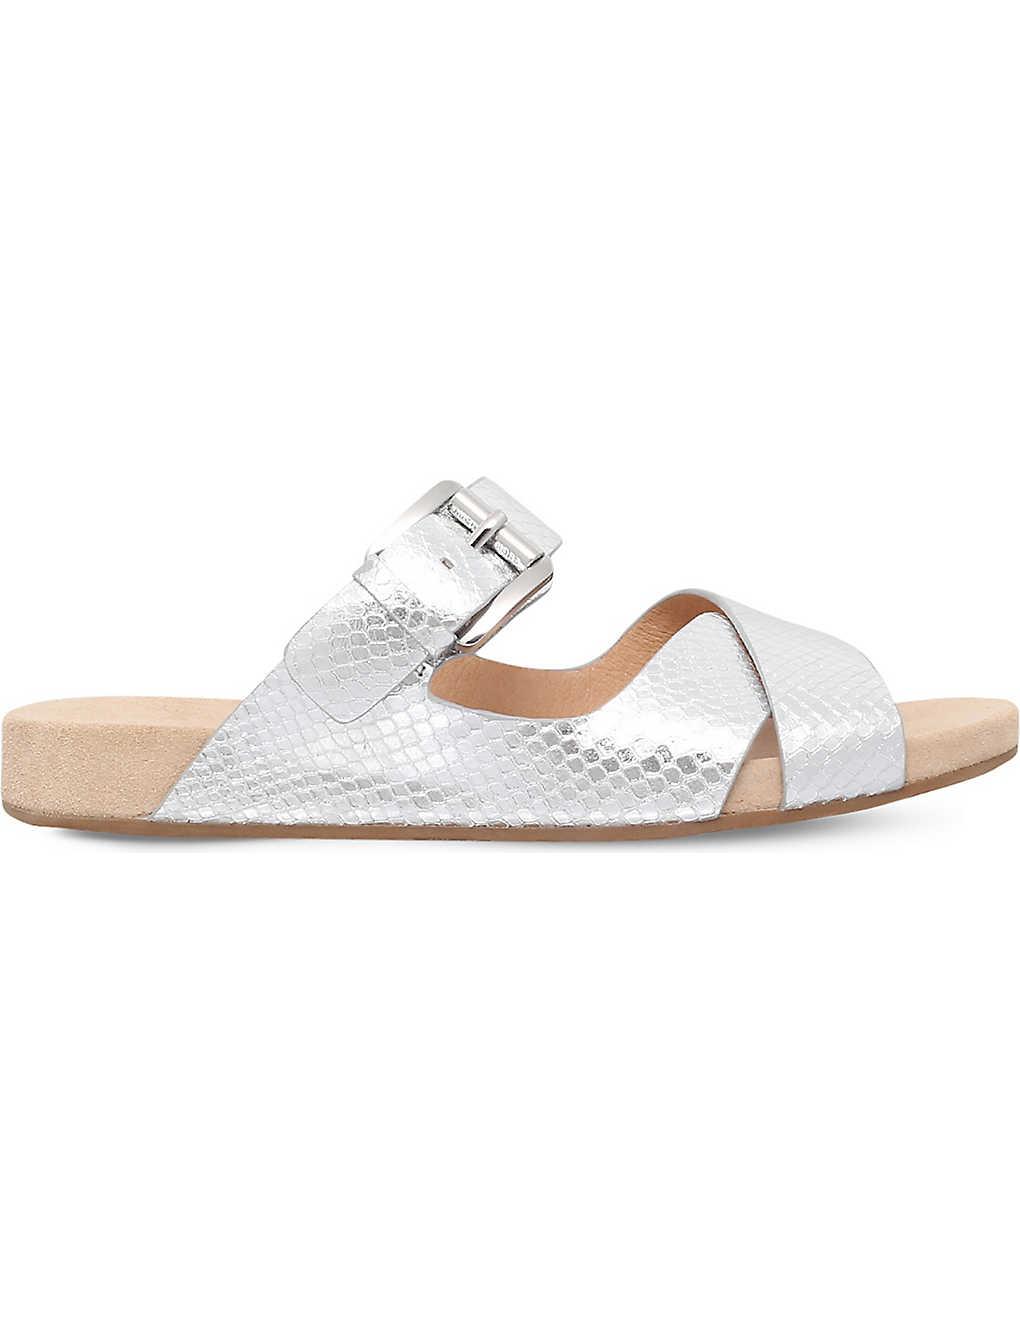 bb16c0aa1 MICHAEL MICHAEL KORS - Sawyer snake-embossed flat sandals ...